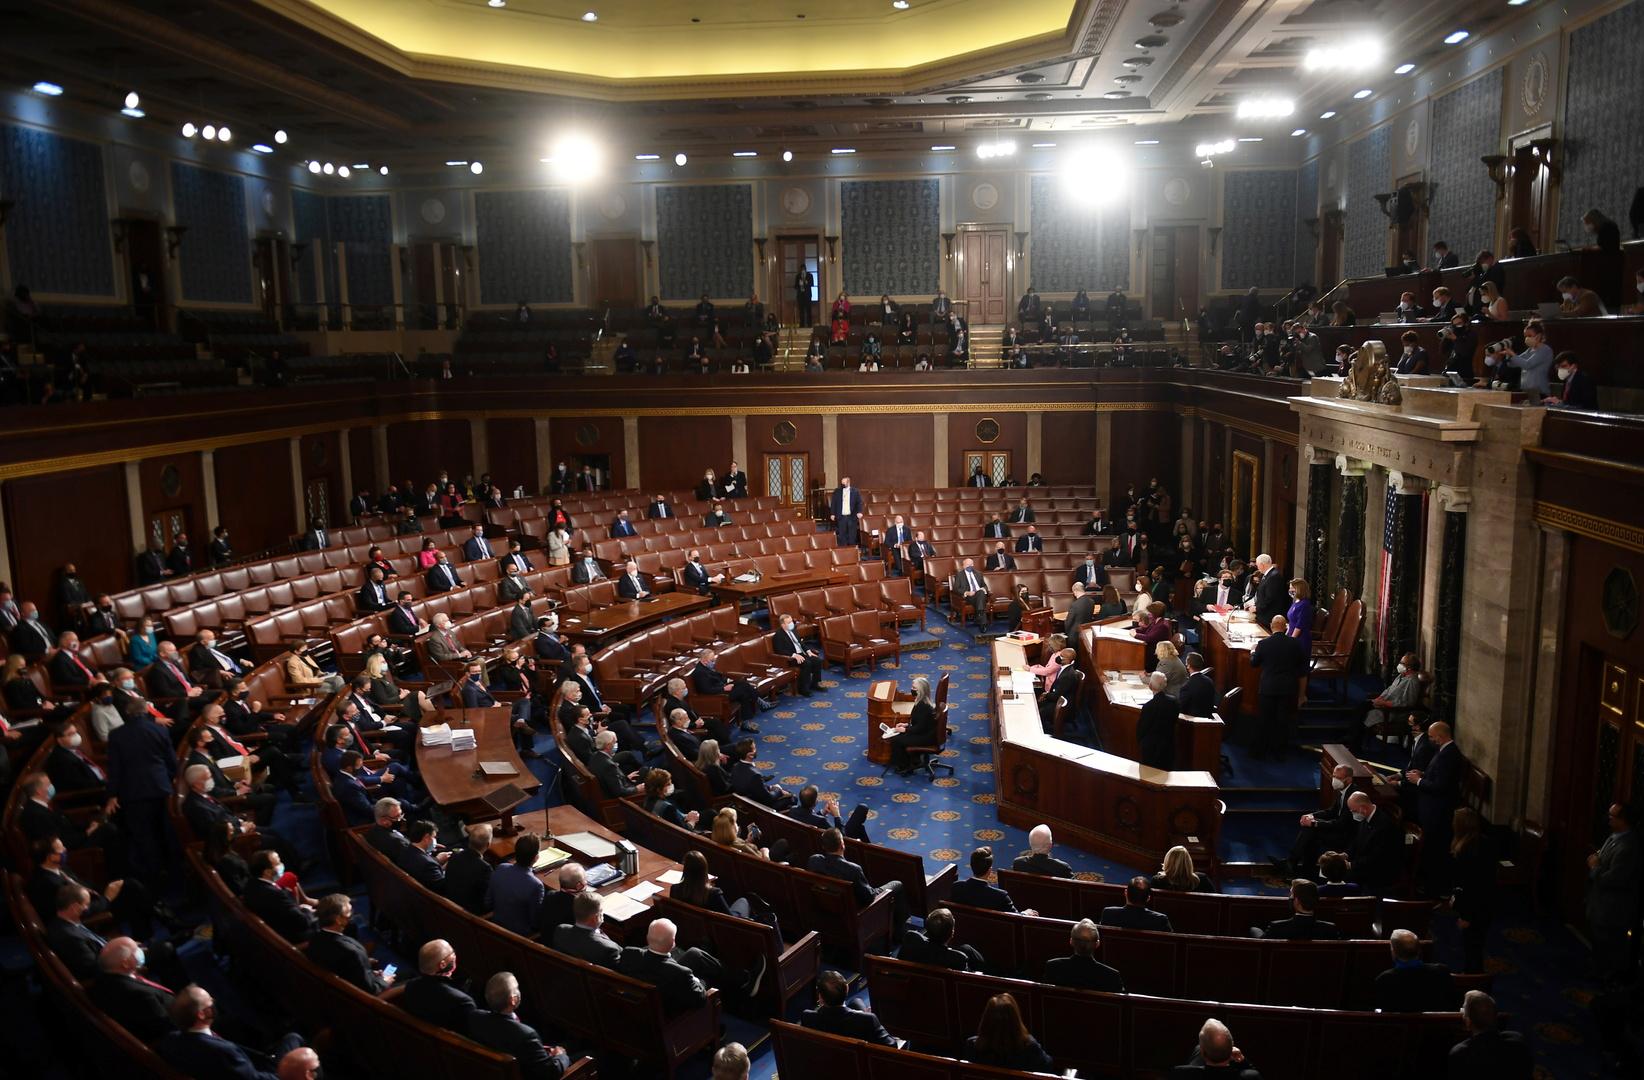 Congress officially confirms Joe Biden's victory in the US presidential election